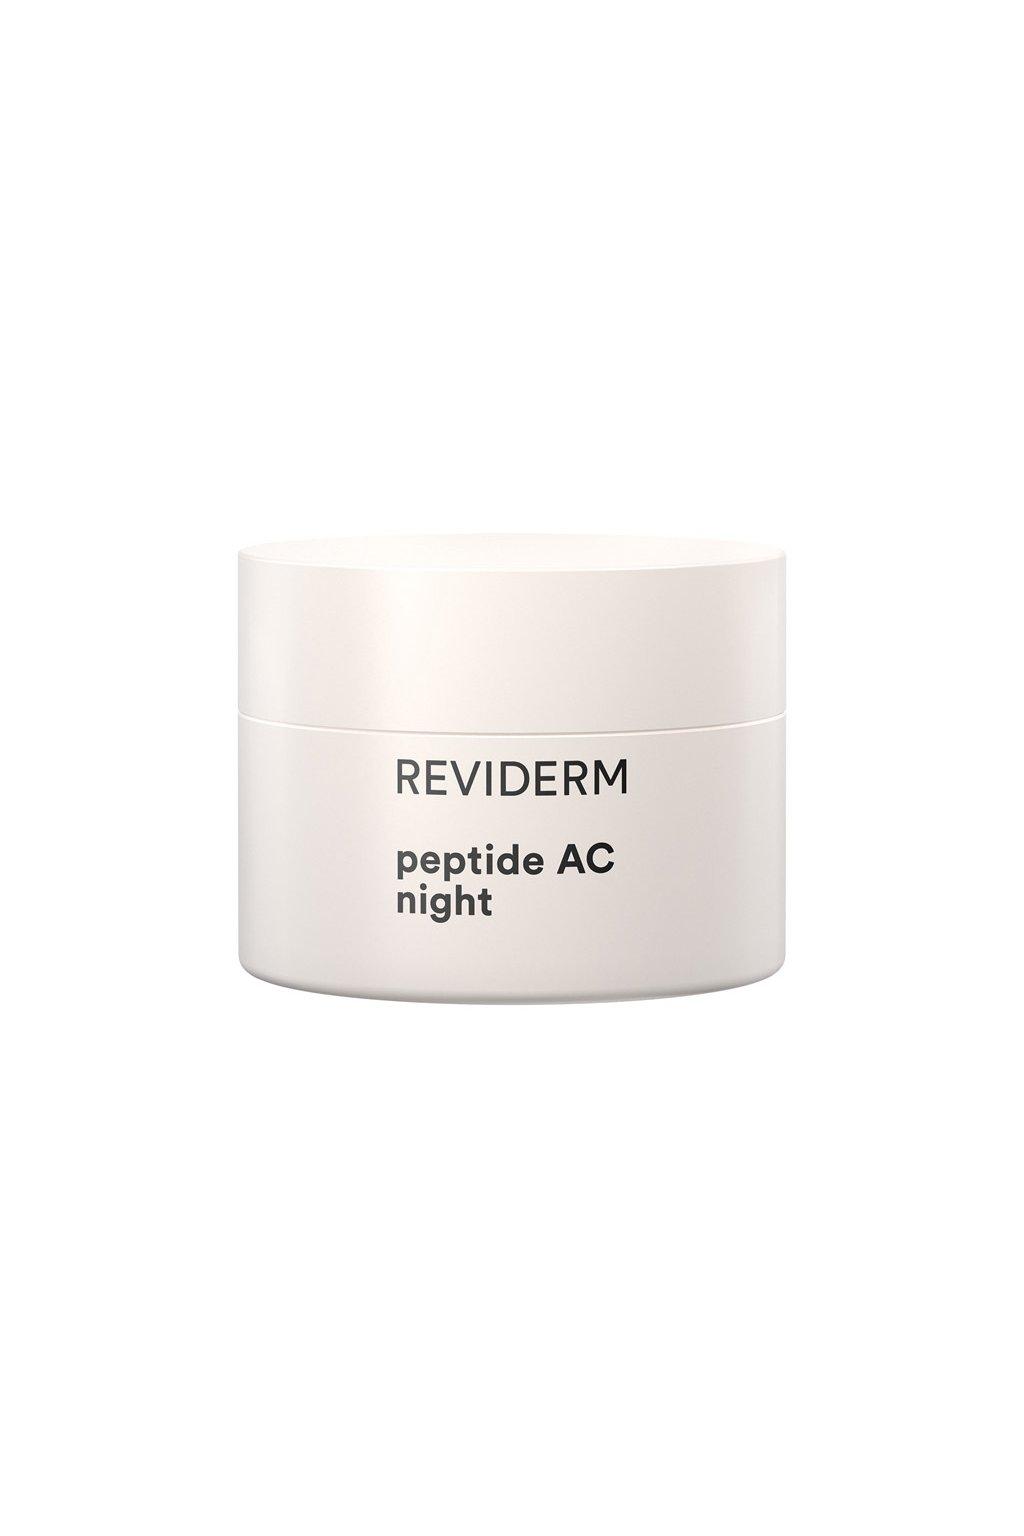 peptide AC night | 50 ml